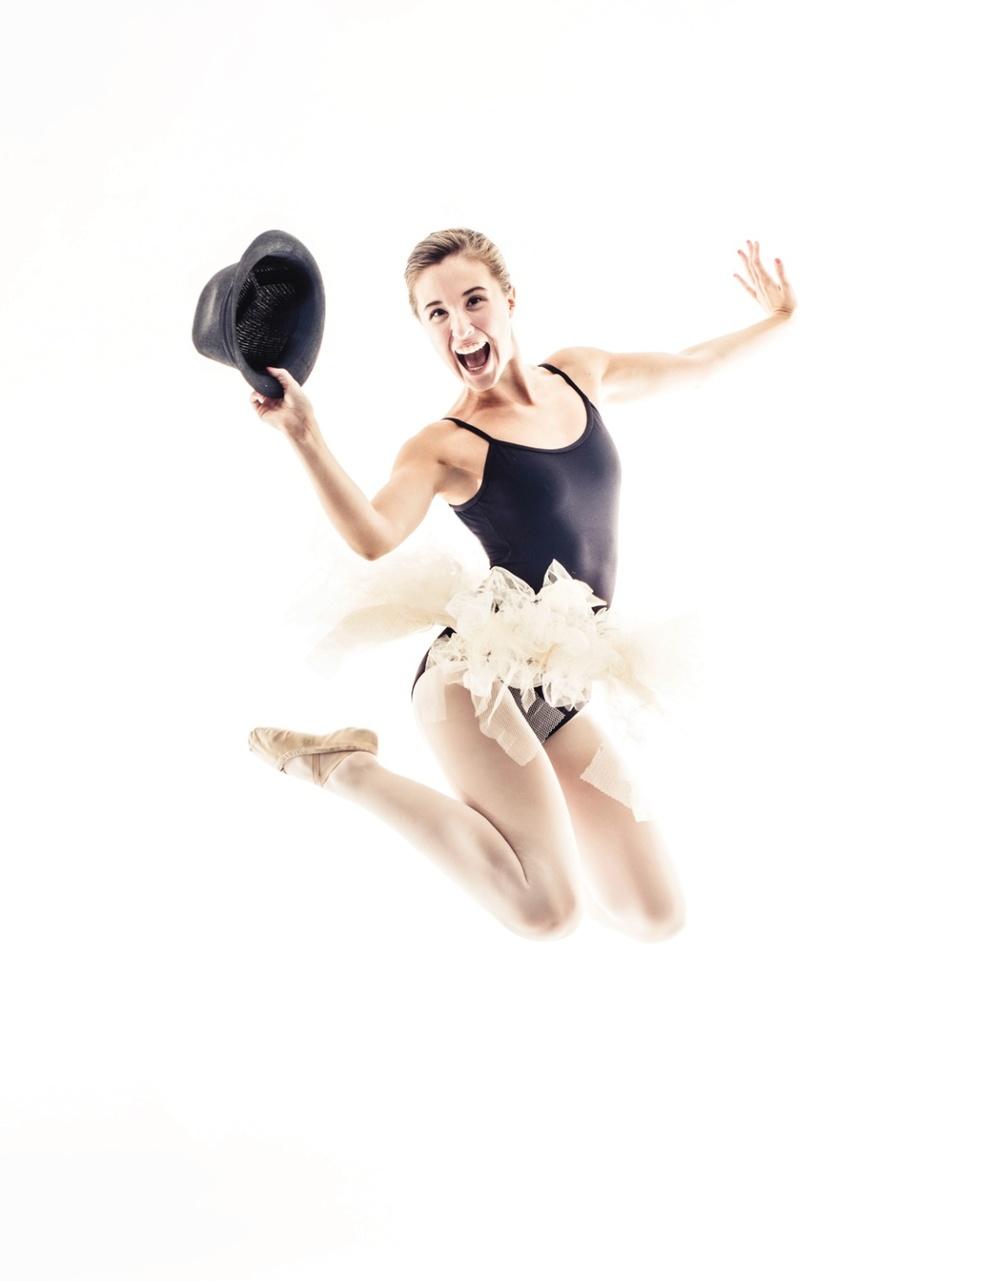 emily dance portrait 2013-9web.jpg